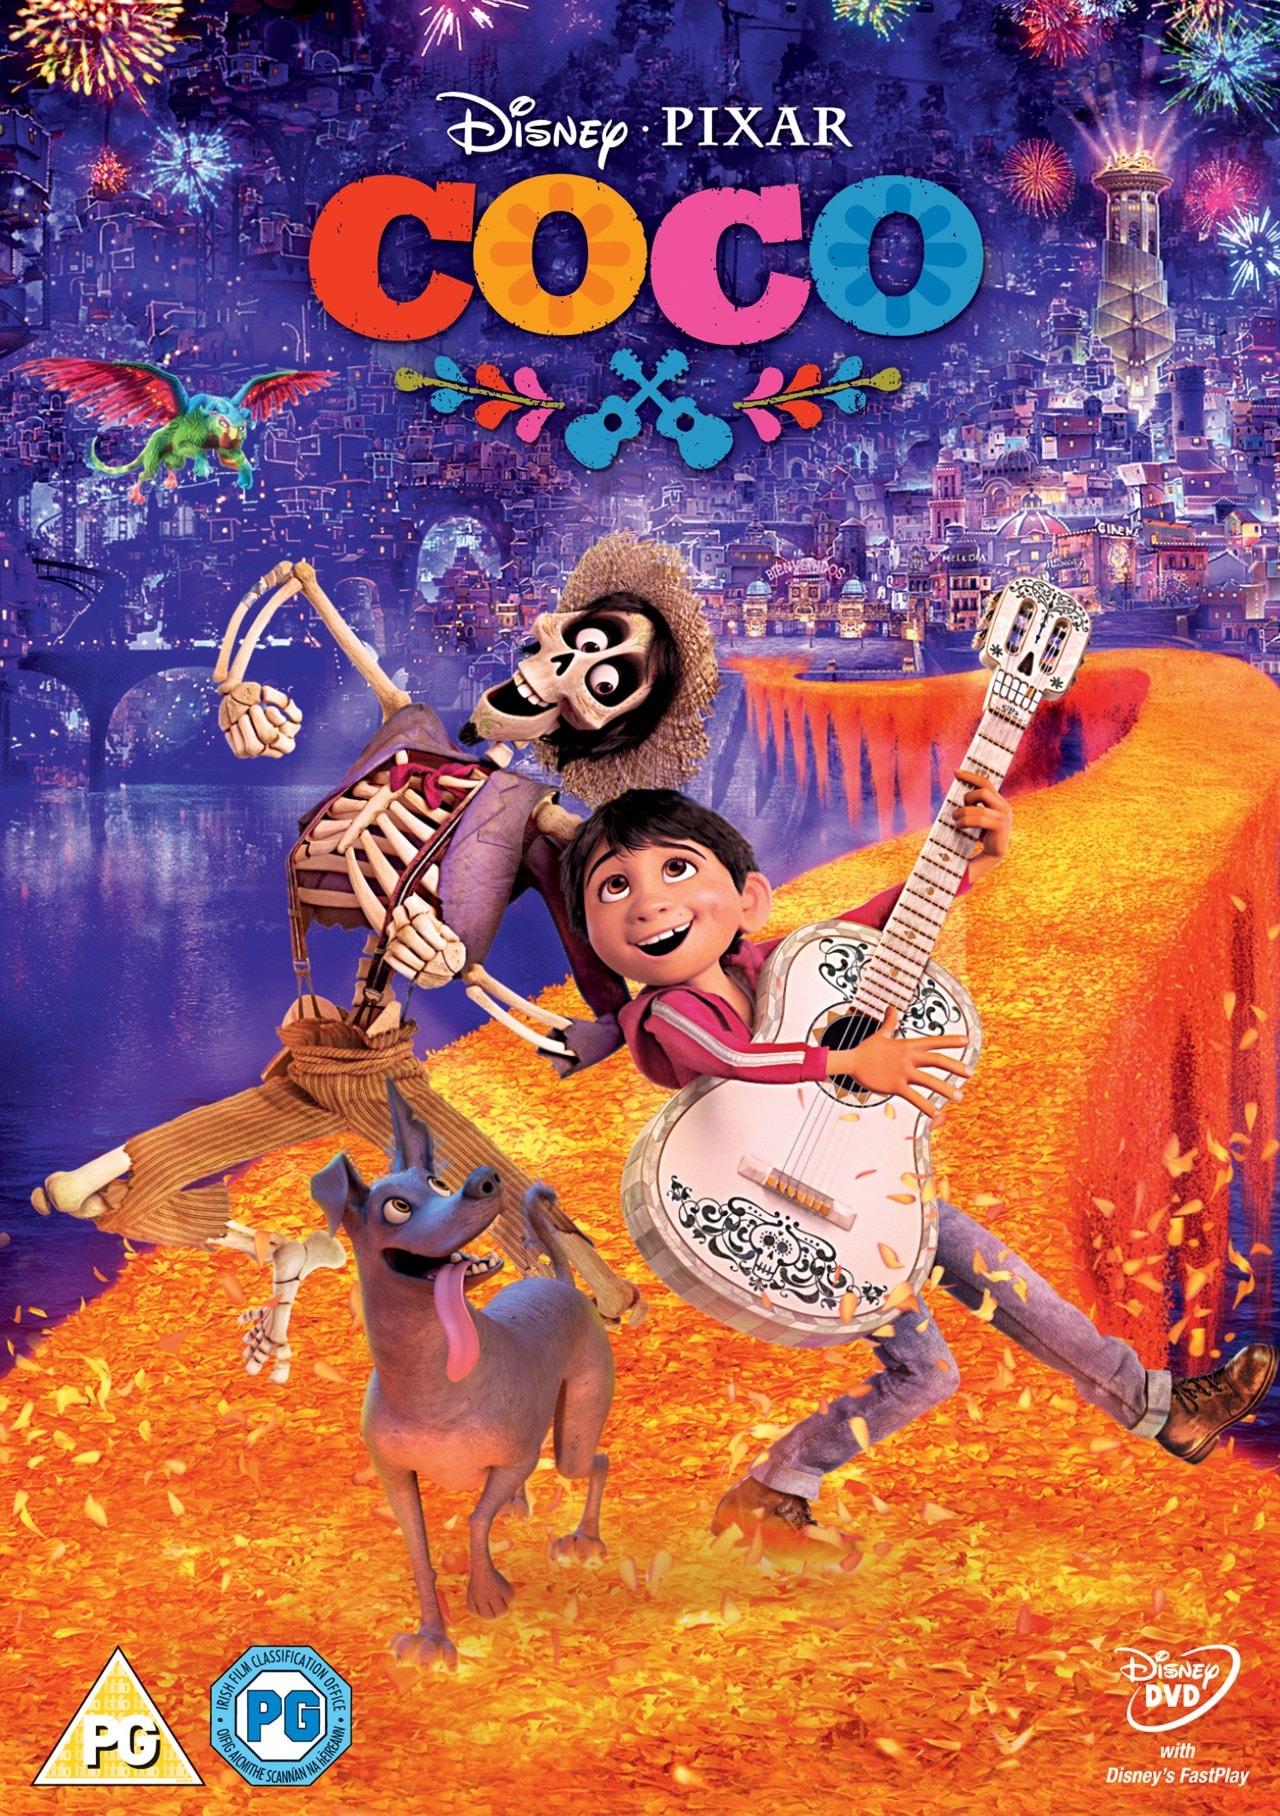 Coco | DVD | Free shipping over £20 | HMV Store